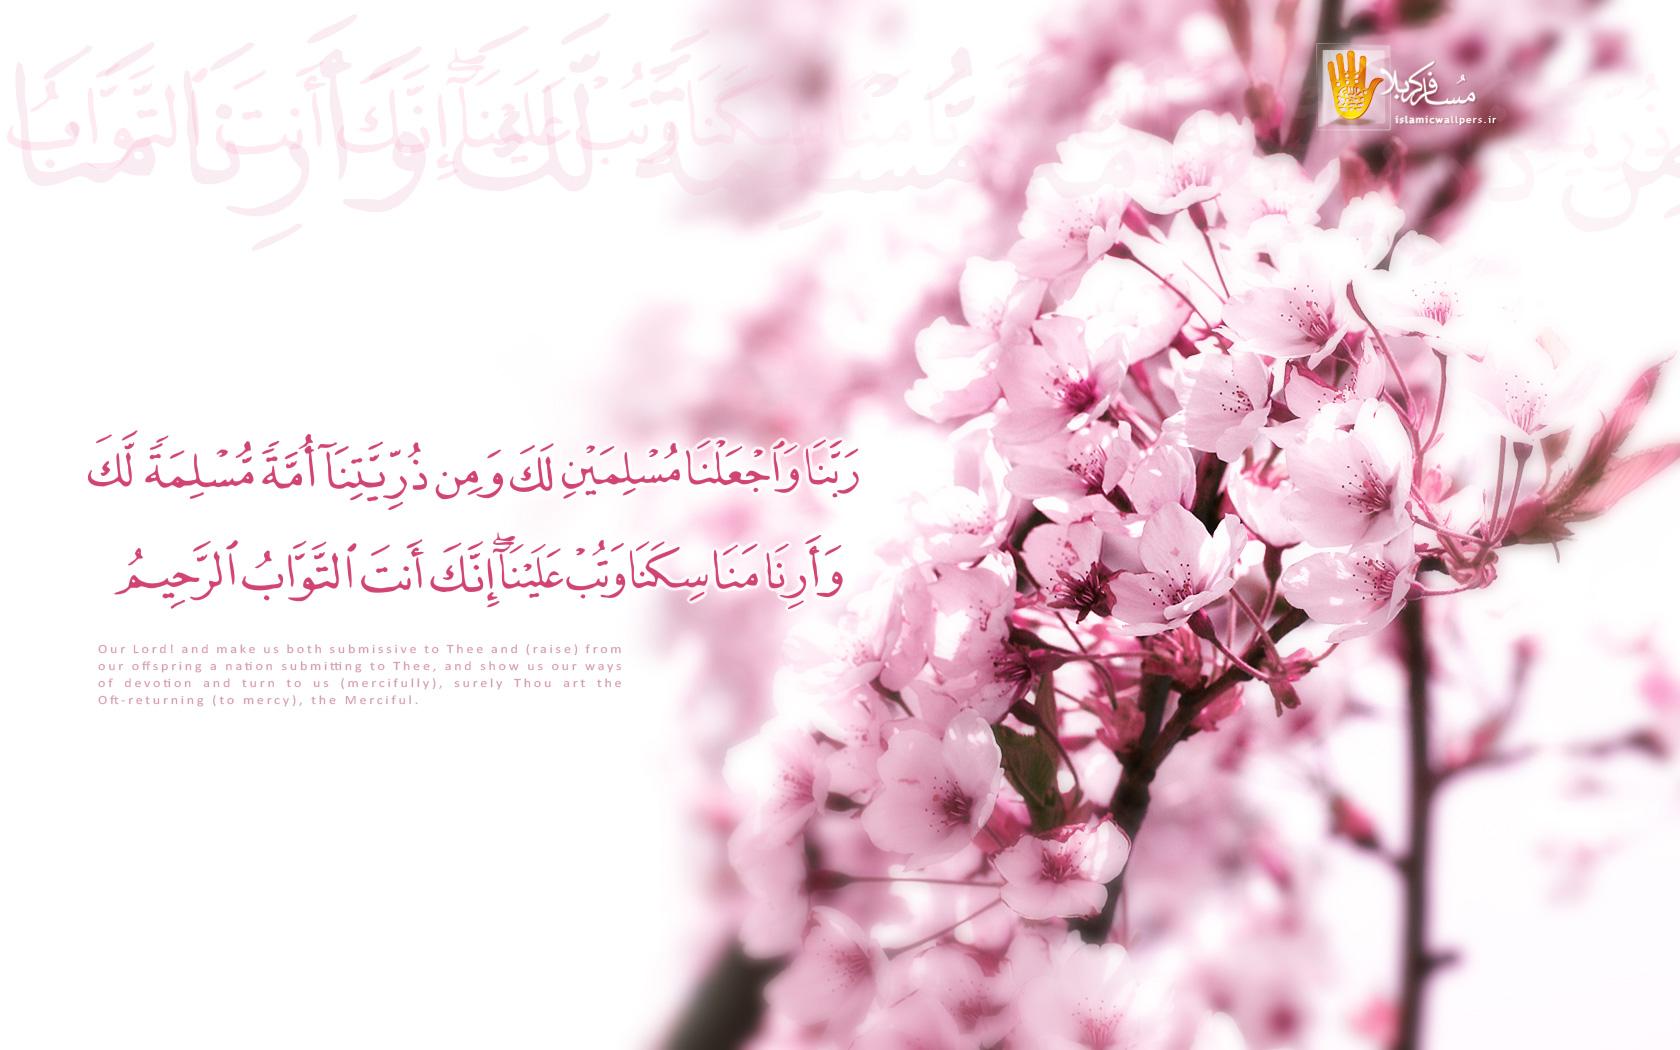 http://www.yasinmedia.com/gallery/originals/islamic-wallpapers_39/___12/allahjj_20130831_1667122971.jpg